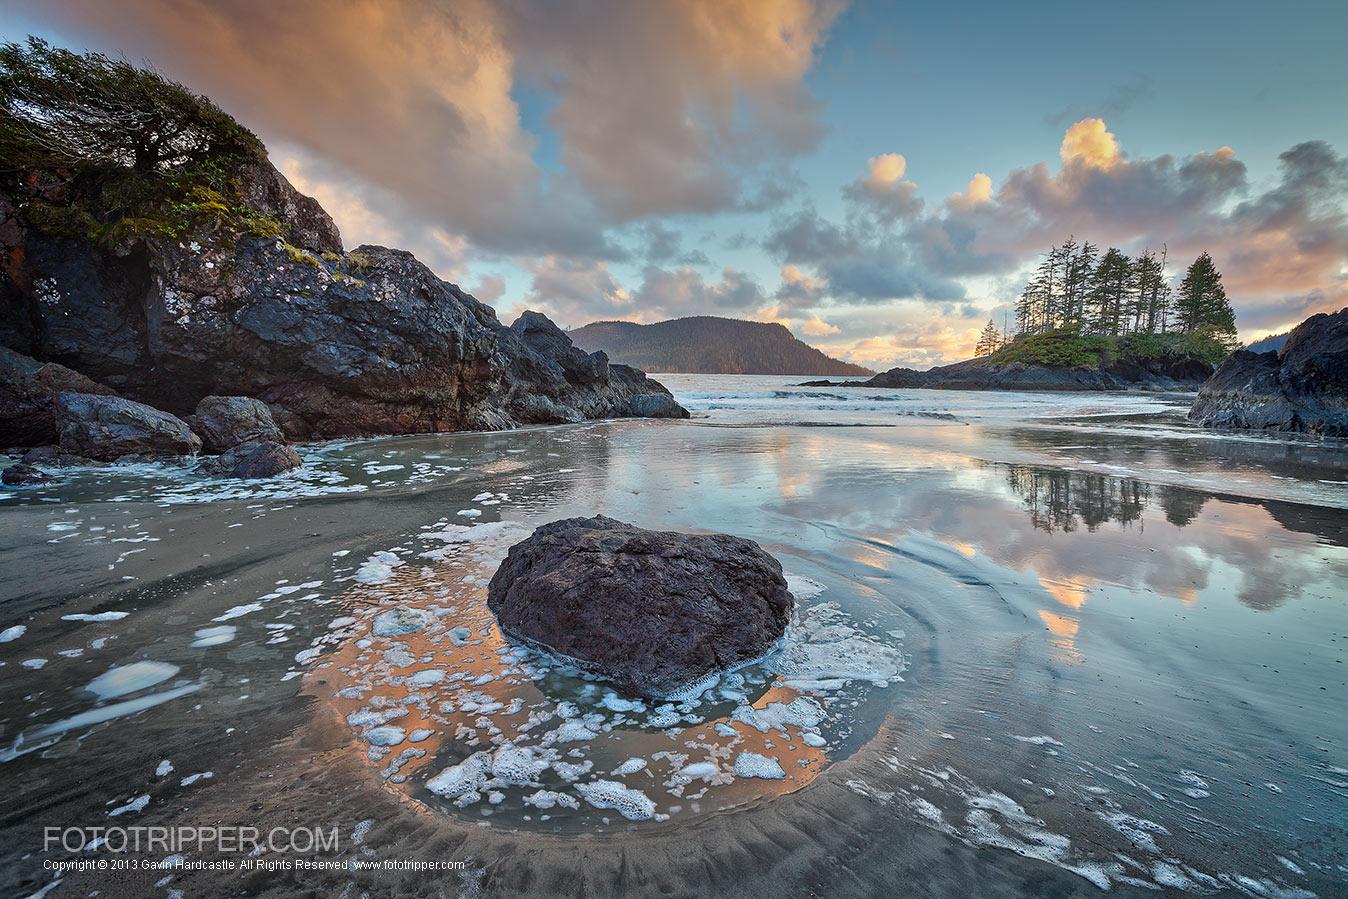 The Photographers Guide to San Josef Bay, Cape Scott